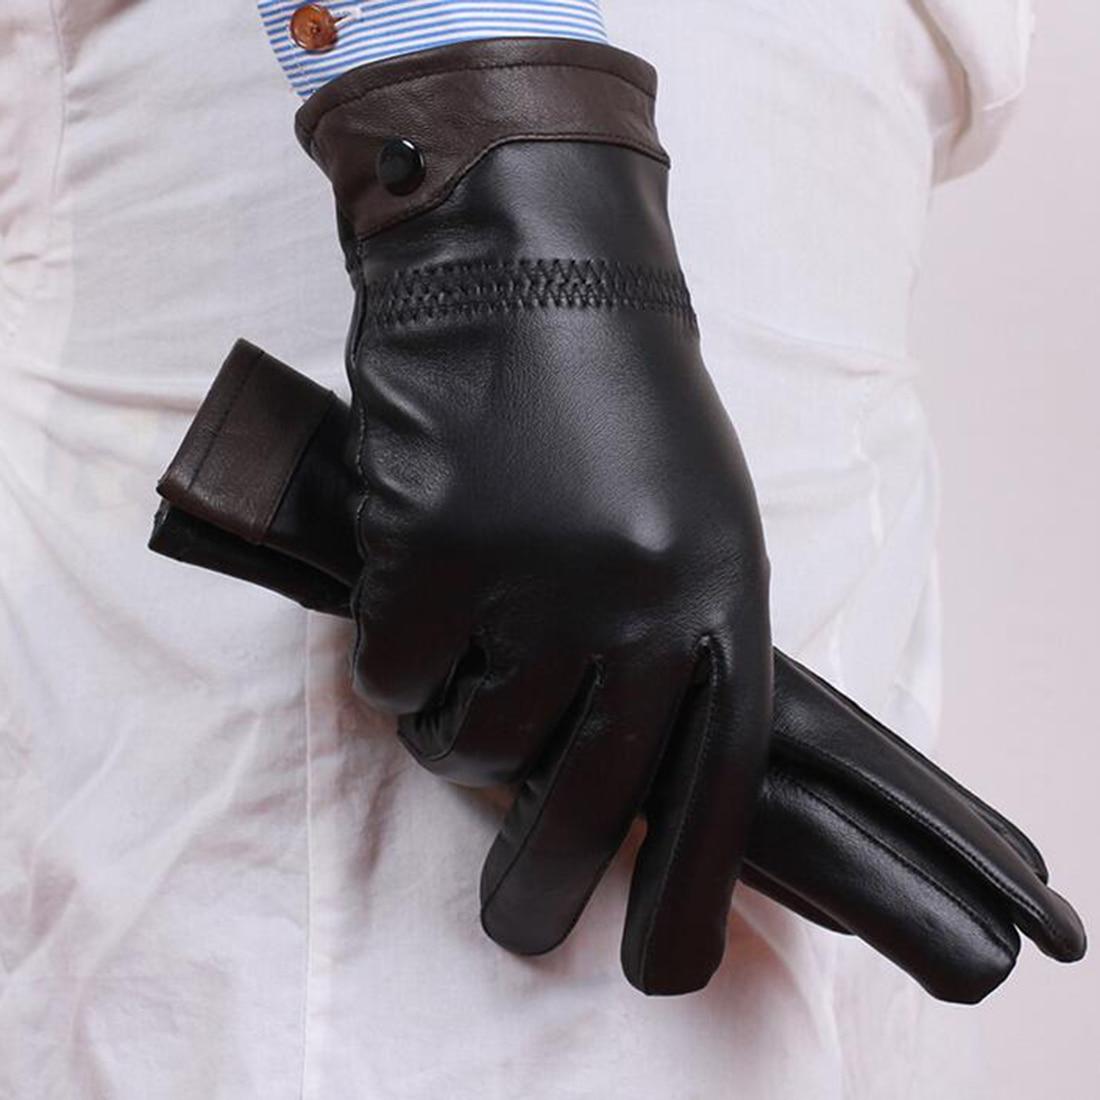 Mens leather gloves sale - Hot Sale Fashion Men Sheepskin Genuine Leather Gloves All Match Thermal Sheepskin Full Finger Gloves